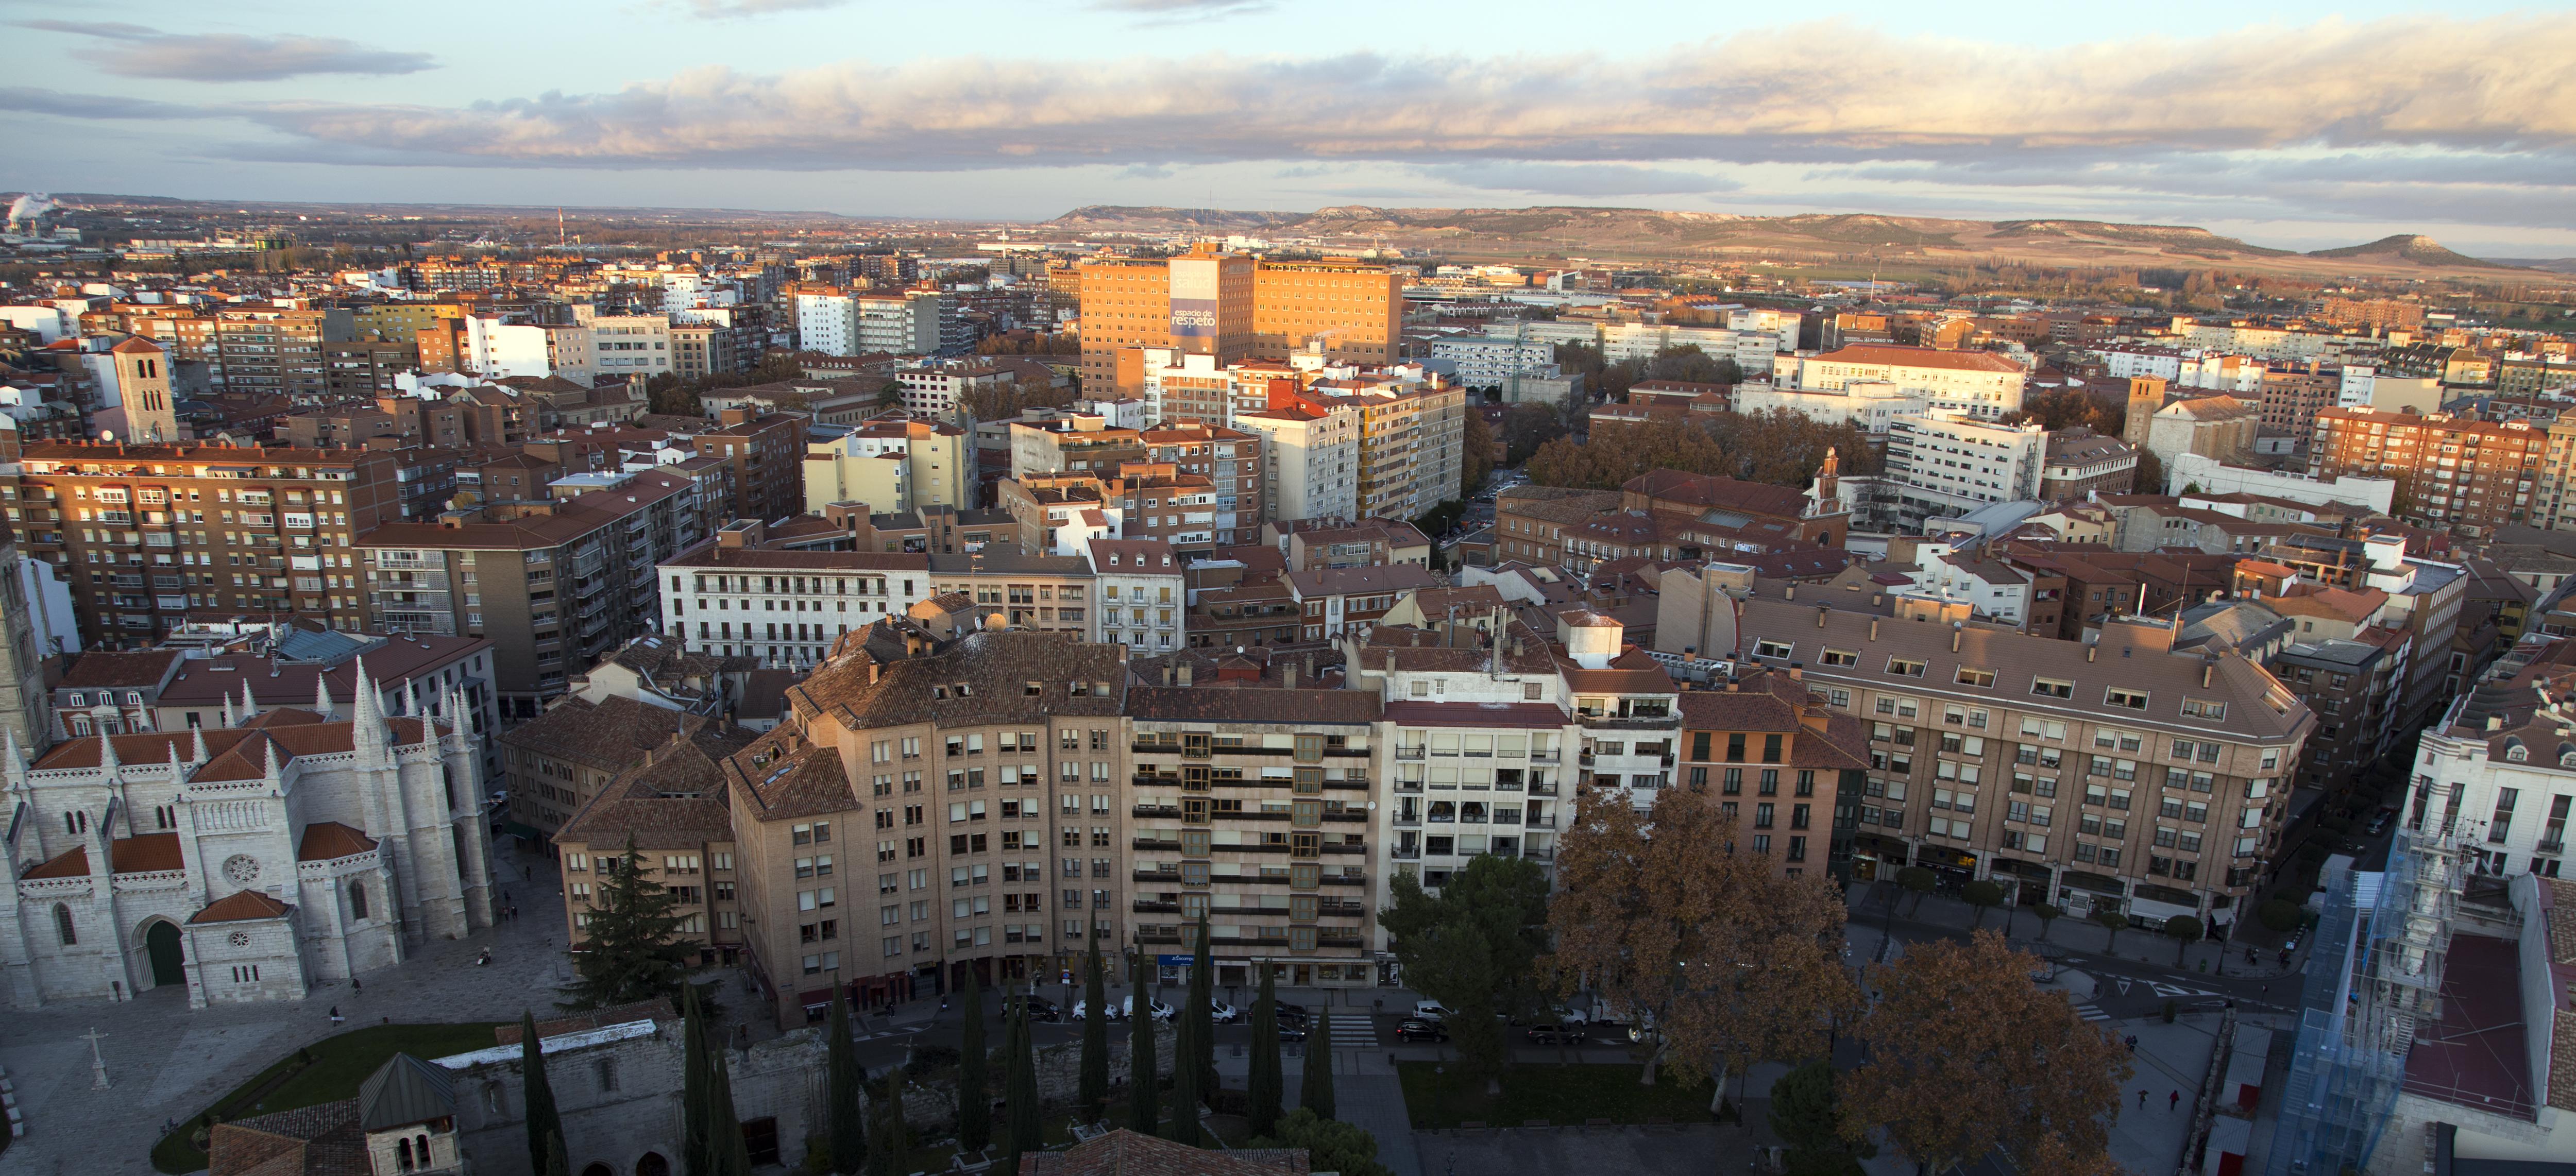 Valladolid 1 murcia calle numero